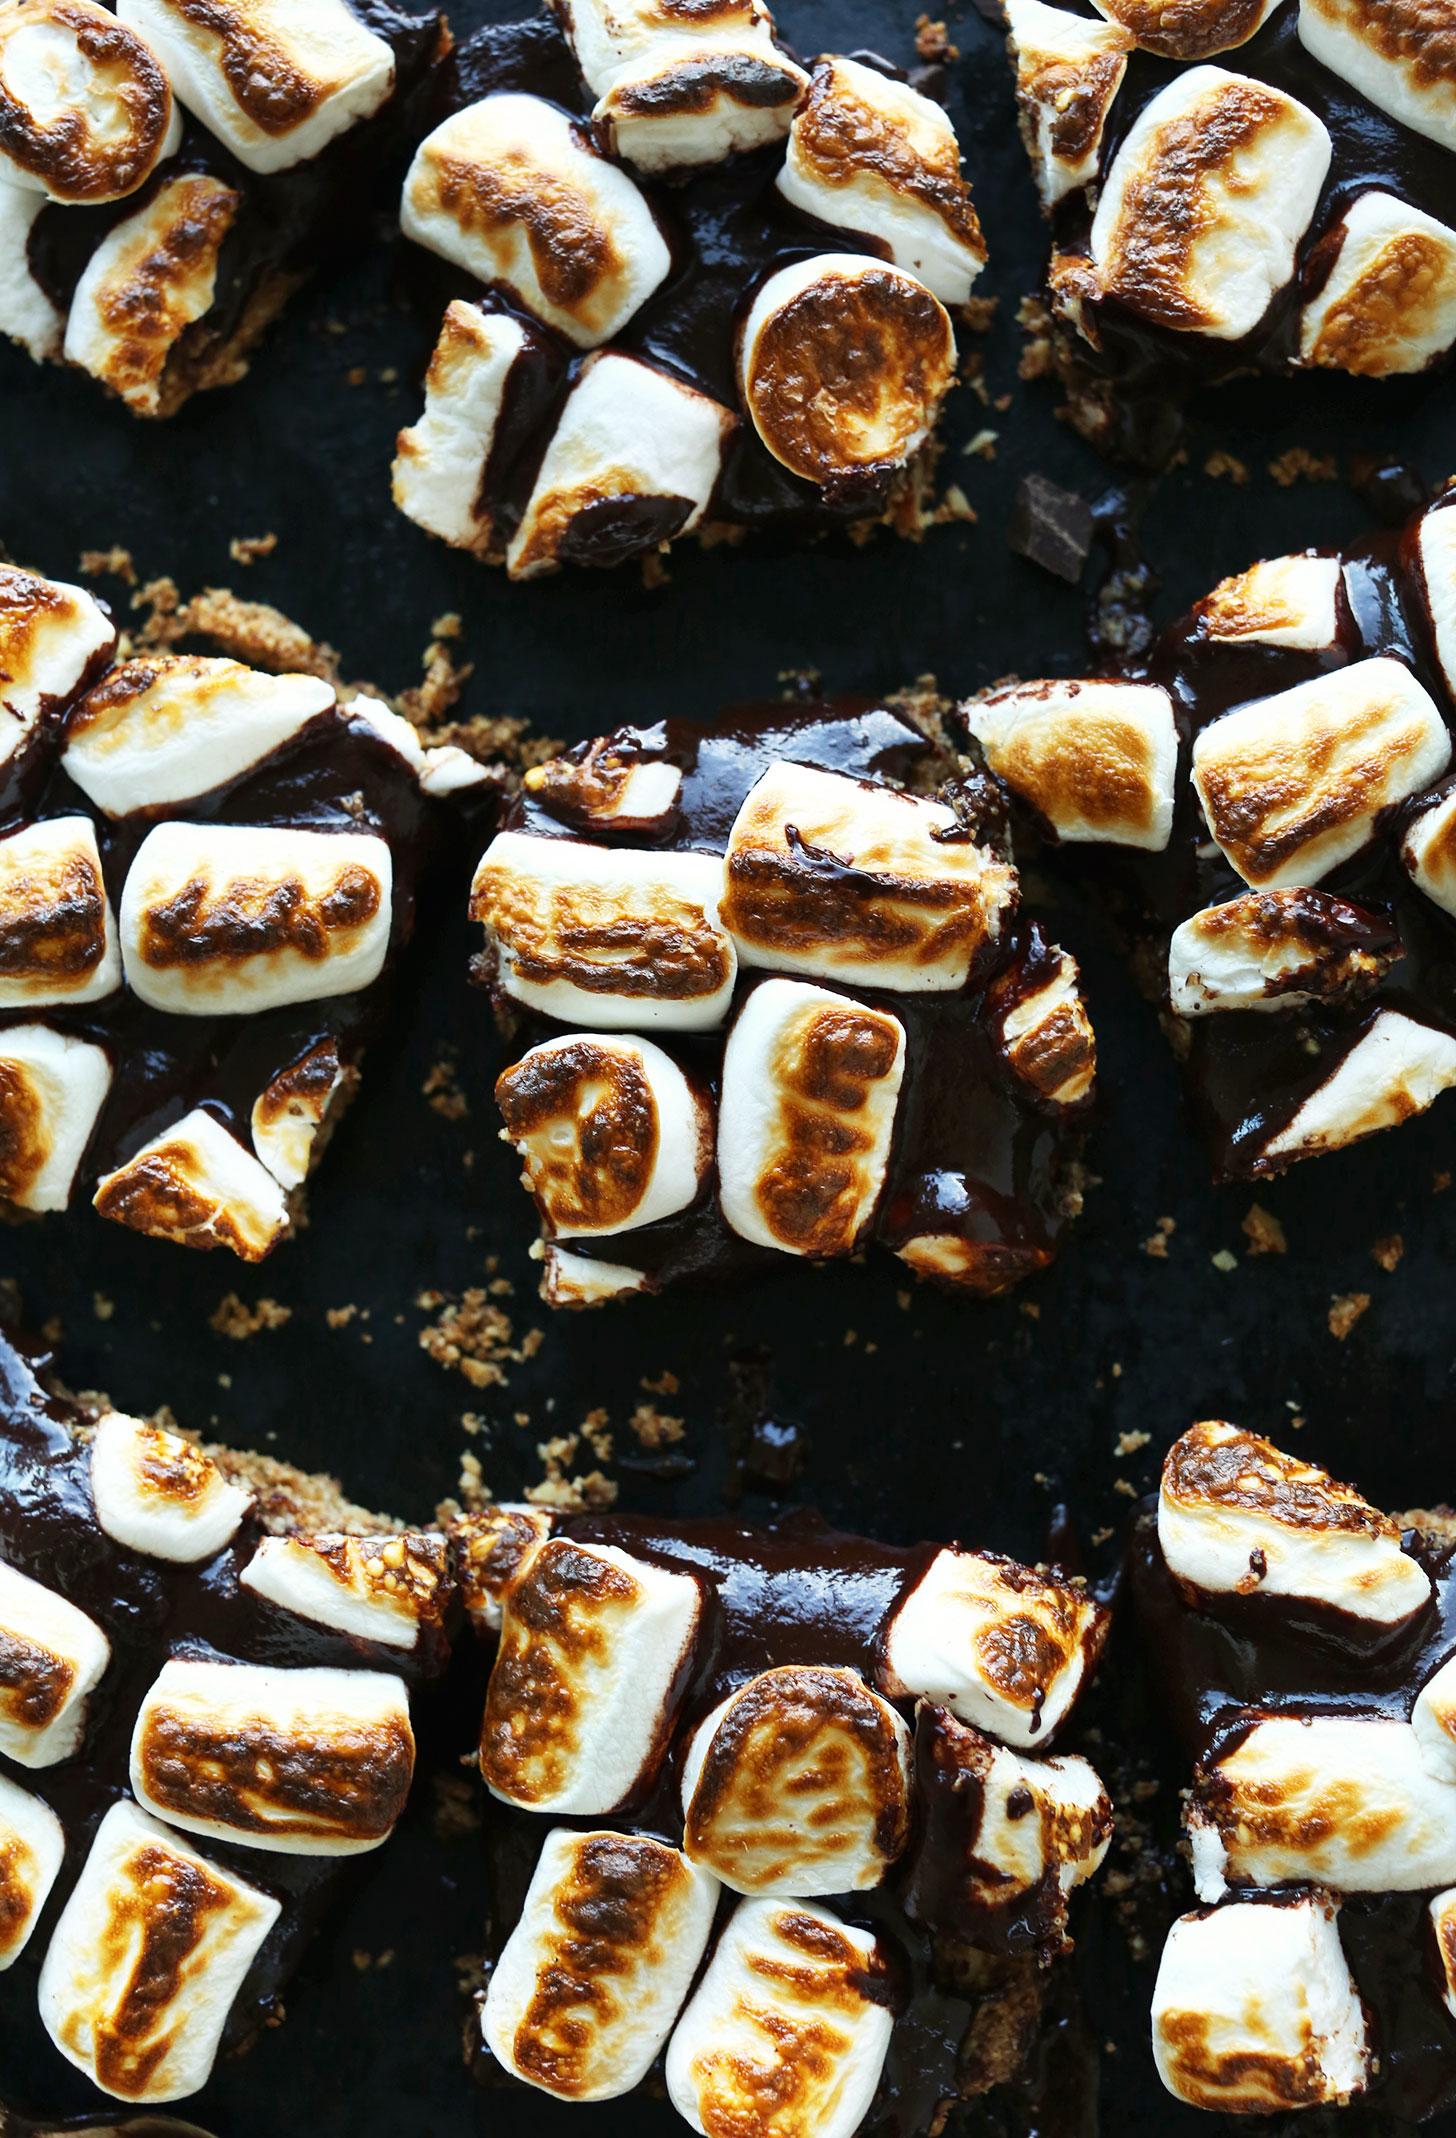 Squares of our Amazing Vegan Gluten-Free S'Mores Bars